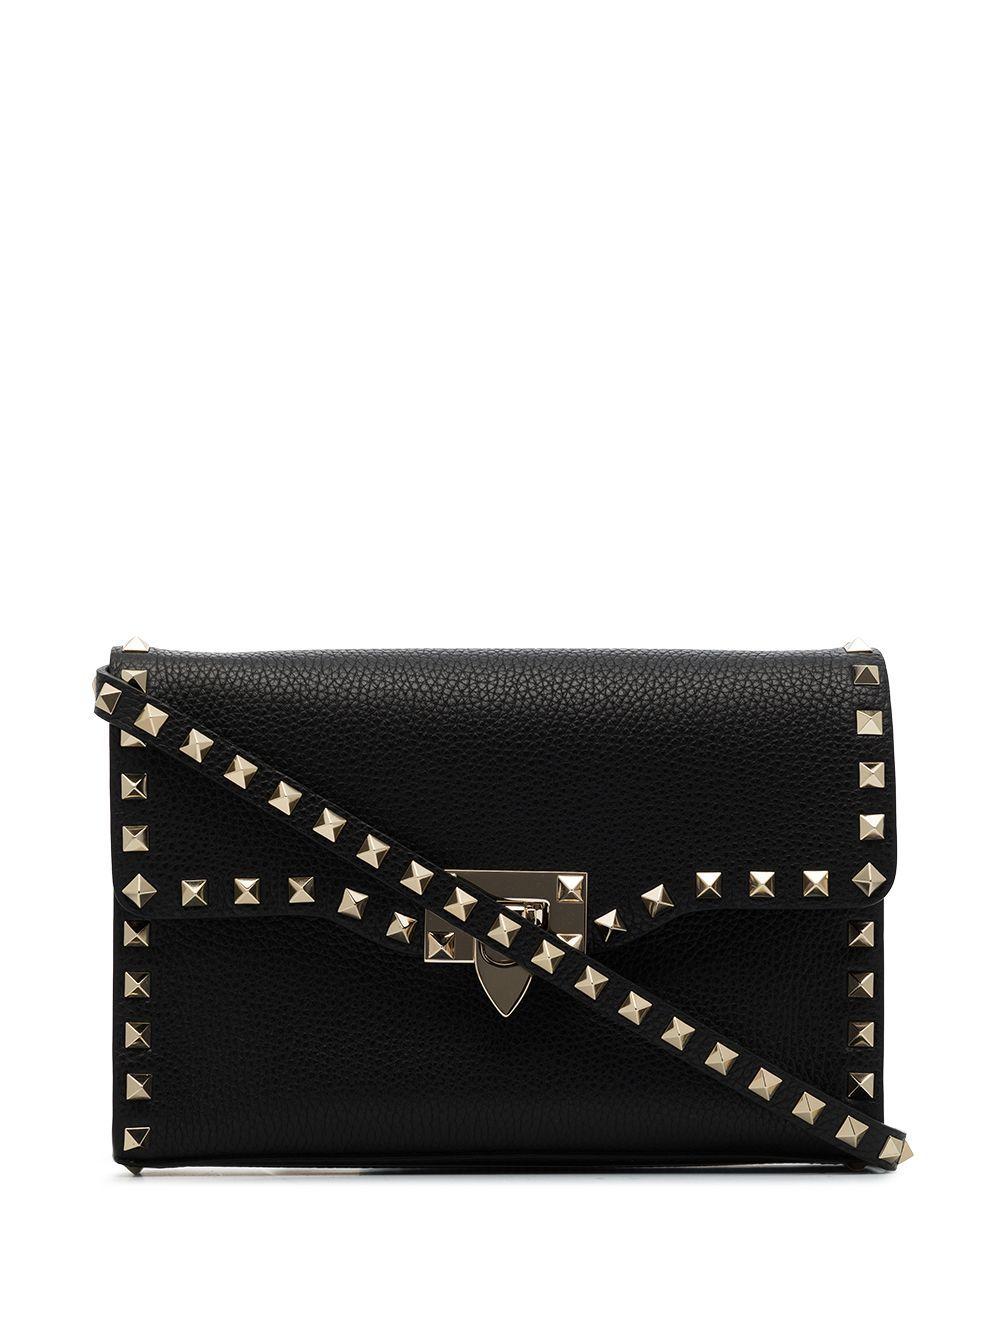 Valentino garavani bags.. black